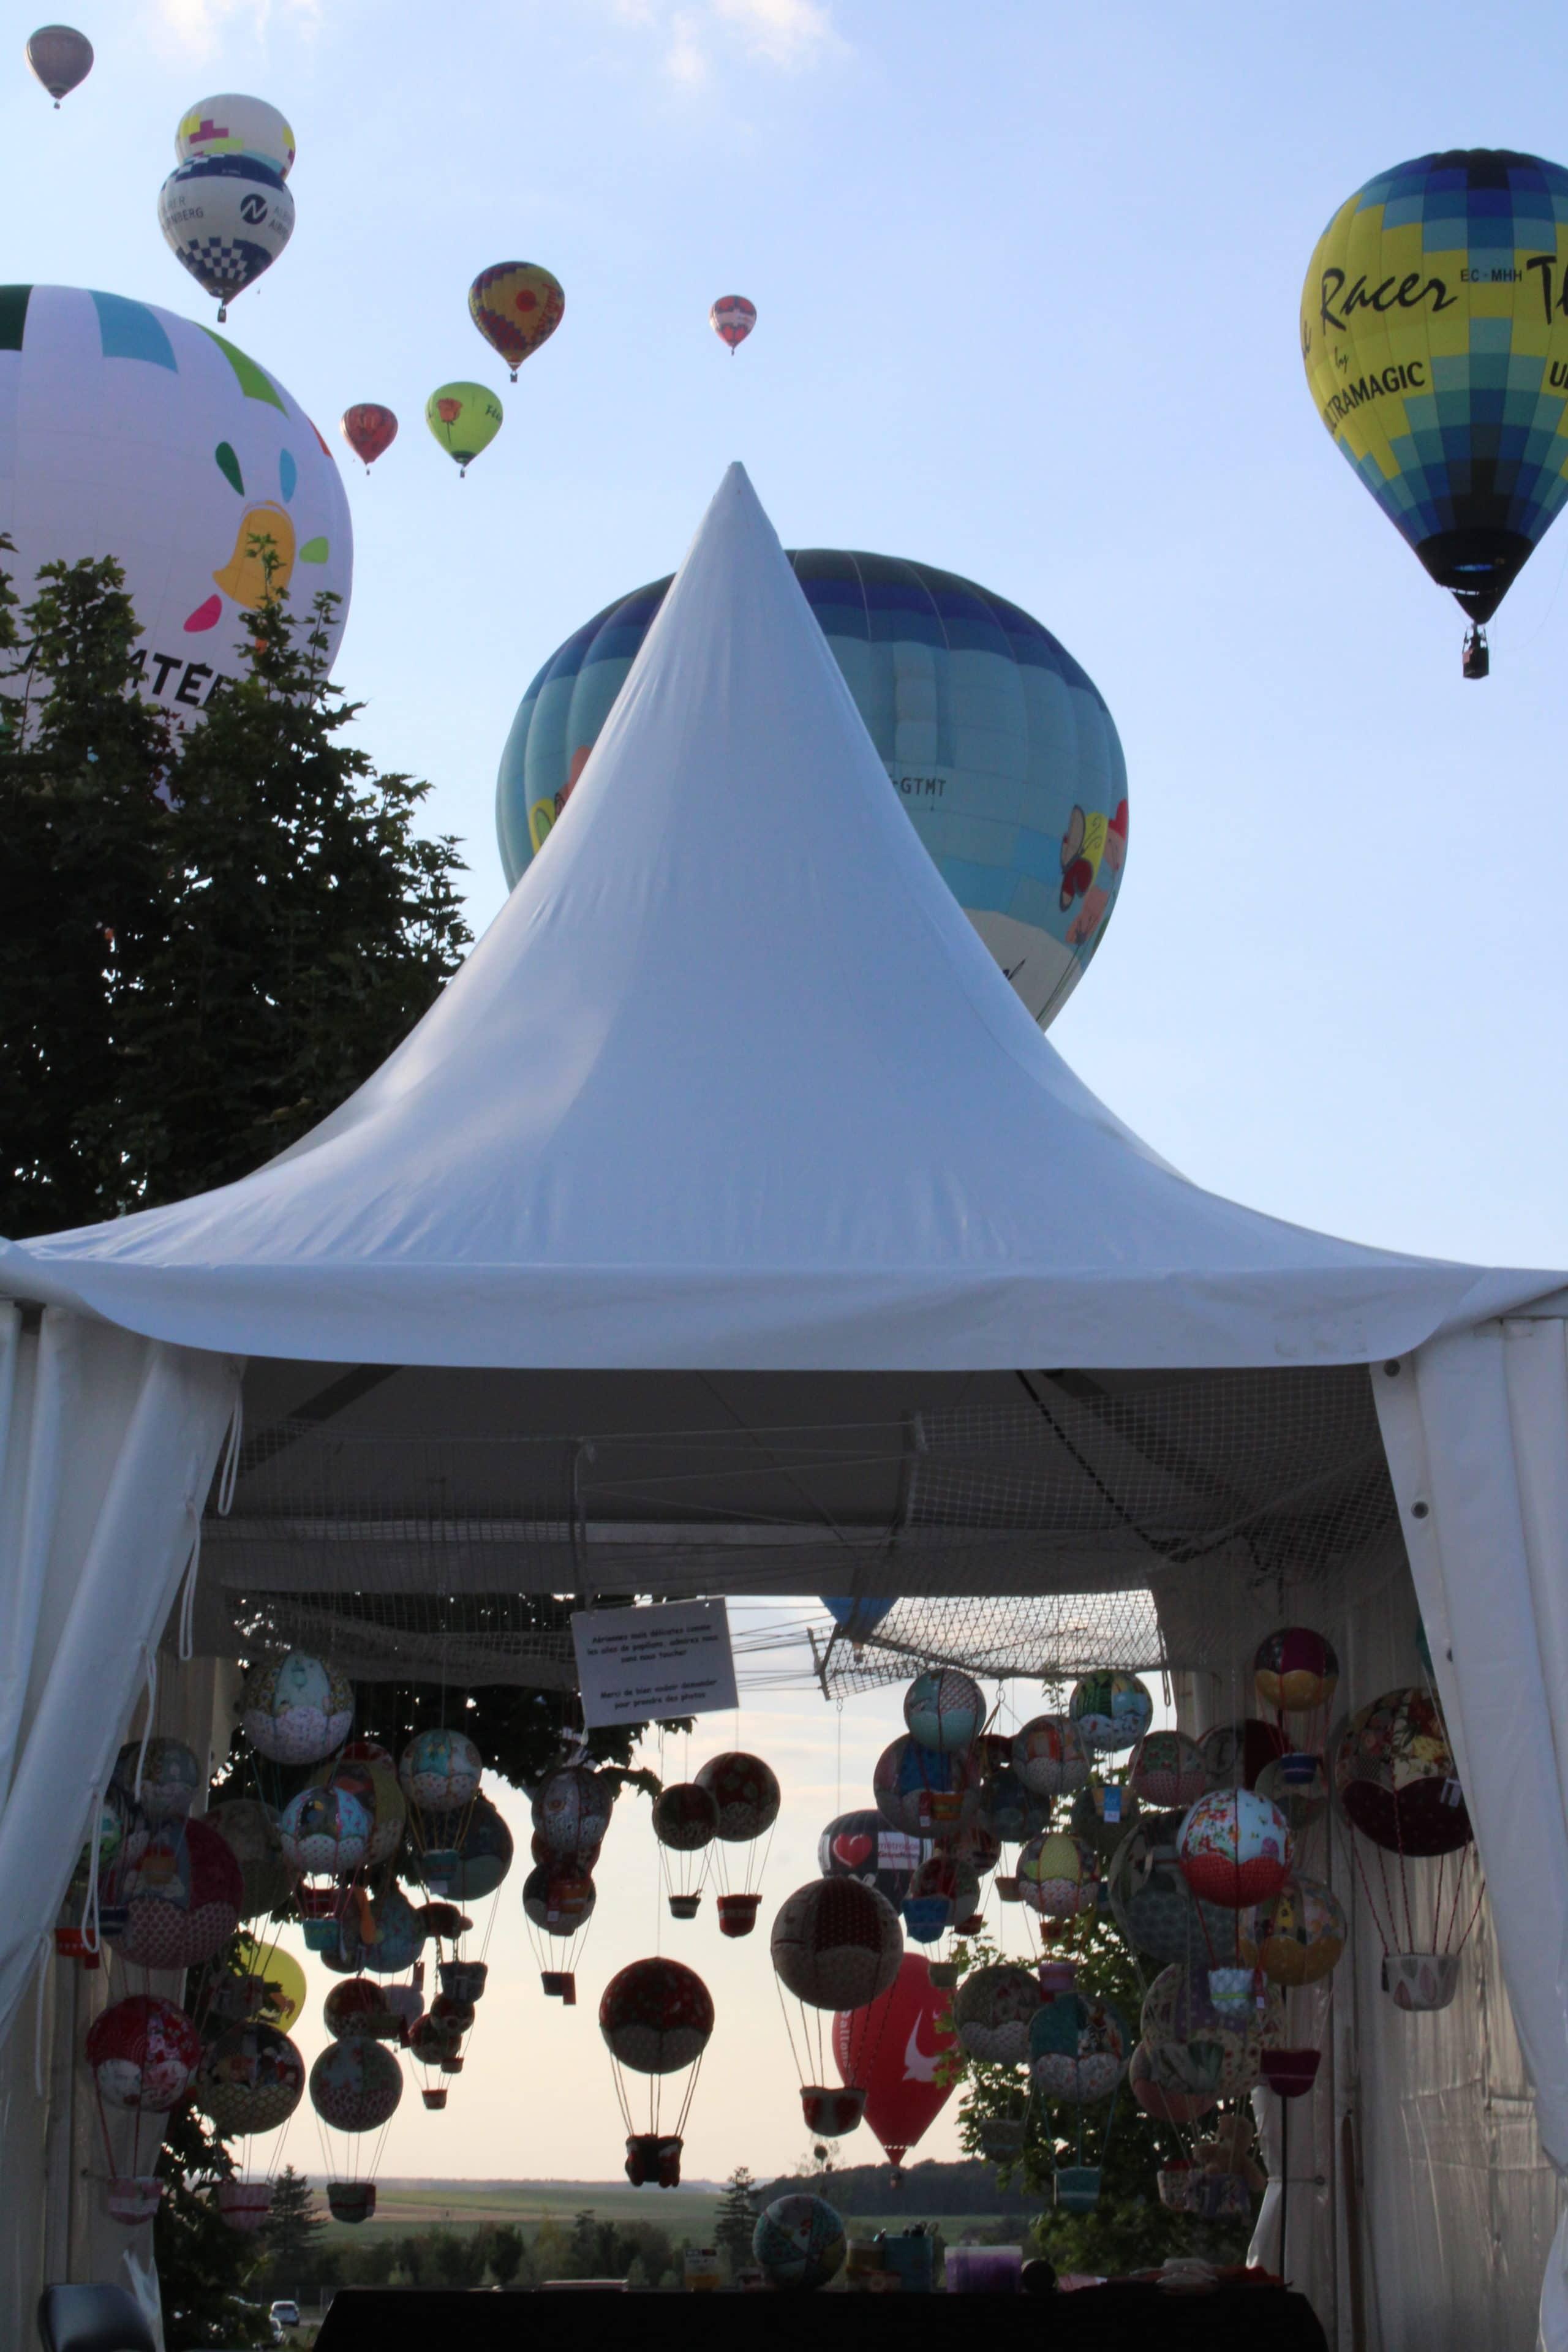 Envol de montgolfières au dessus de montgolfières en tissu